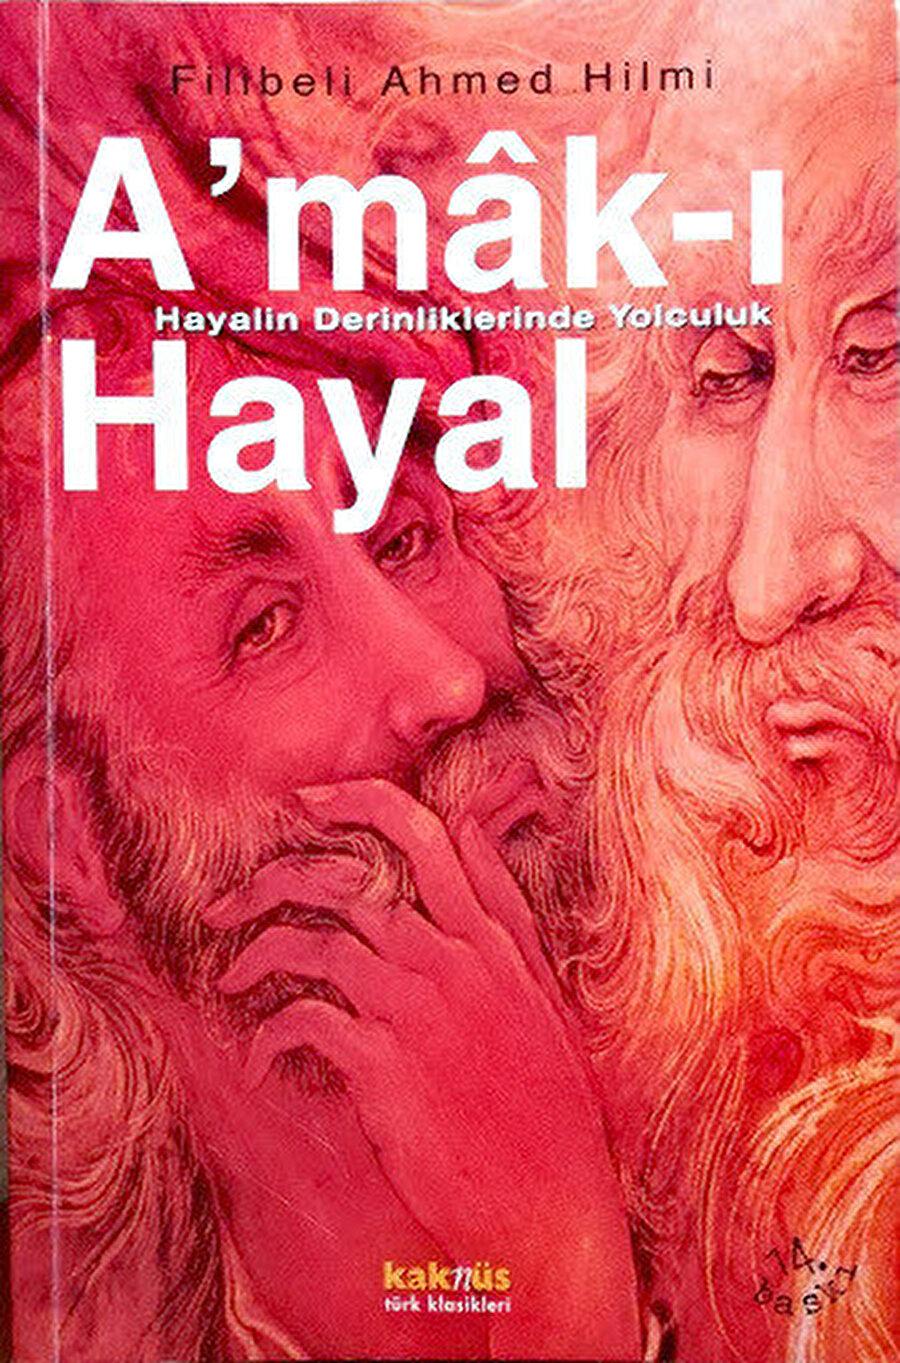 Filibeli Ahmed Hilmi'nin ünlü kitabı.